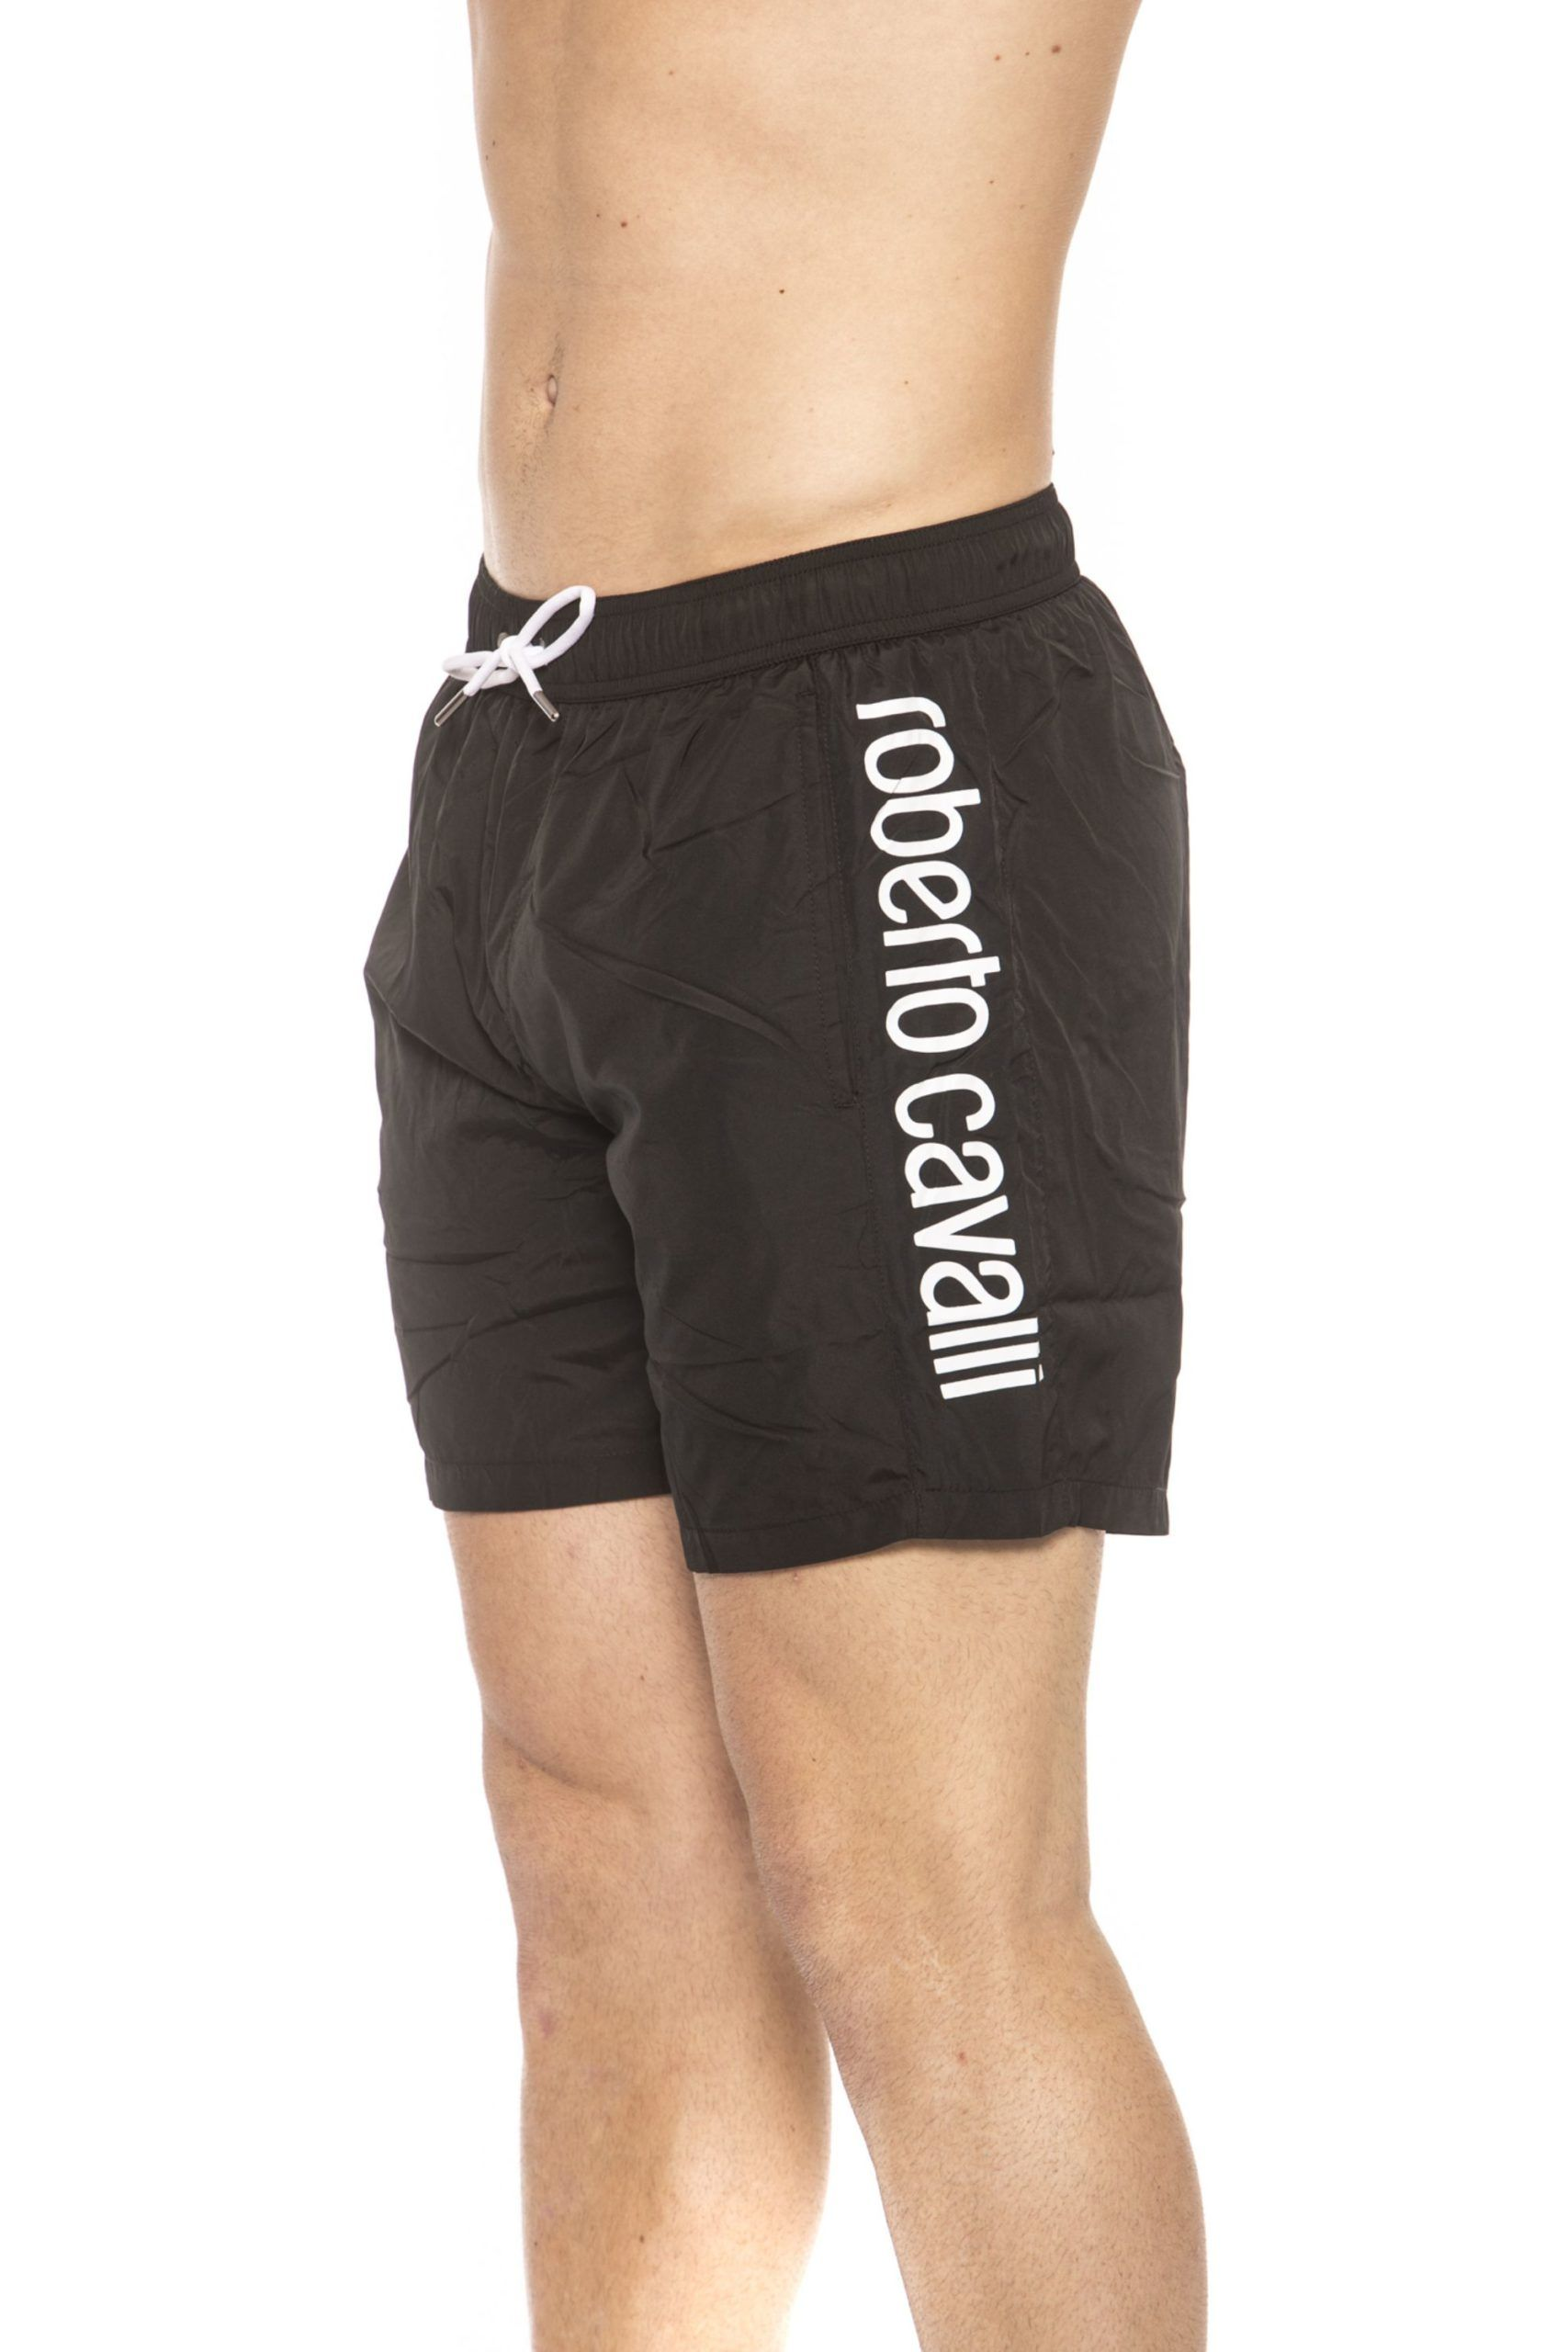 Roberto Cavalli Beachwear Black Beachwear Boxer With Pockets. Side Logo Print. Internal Net. Back Pocket